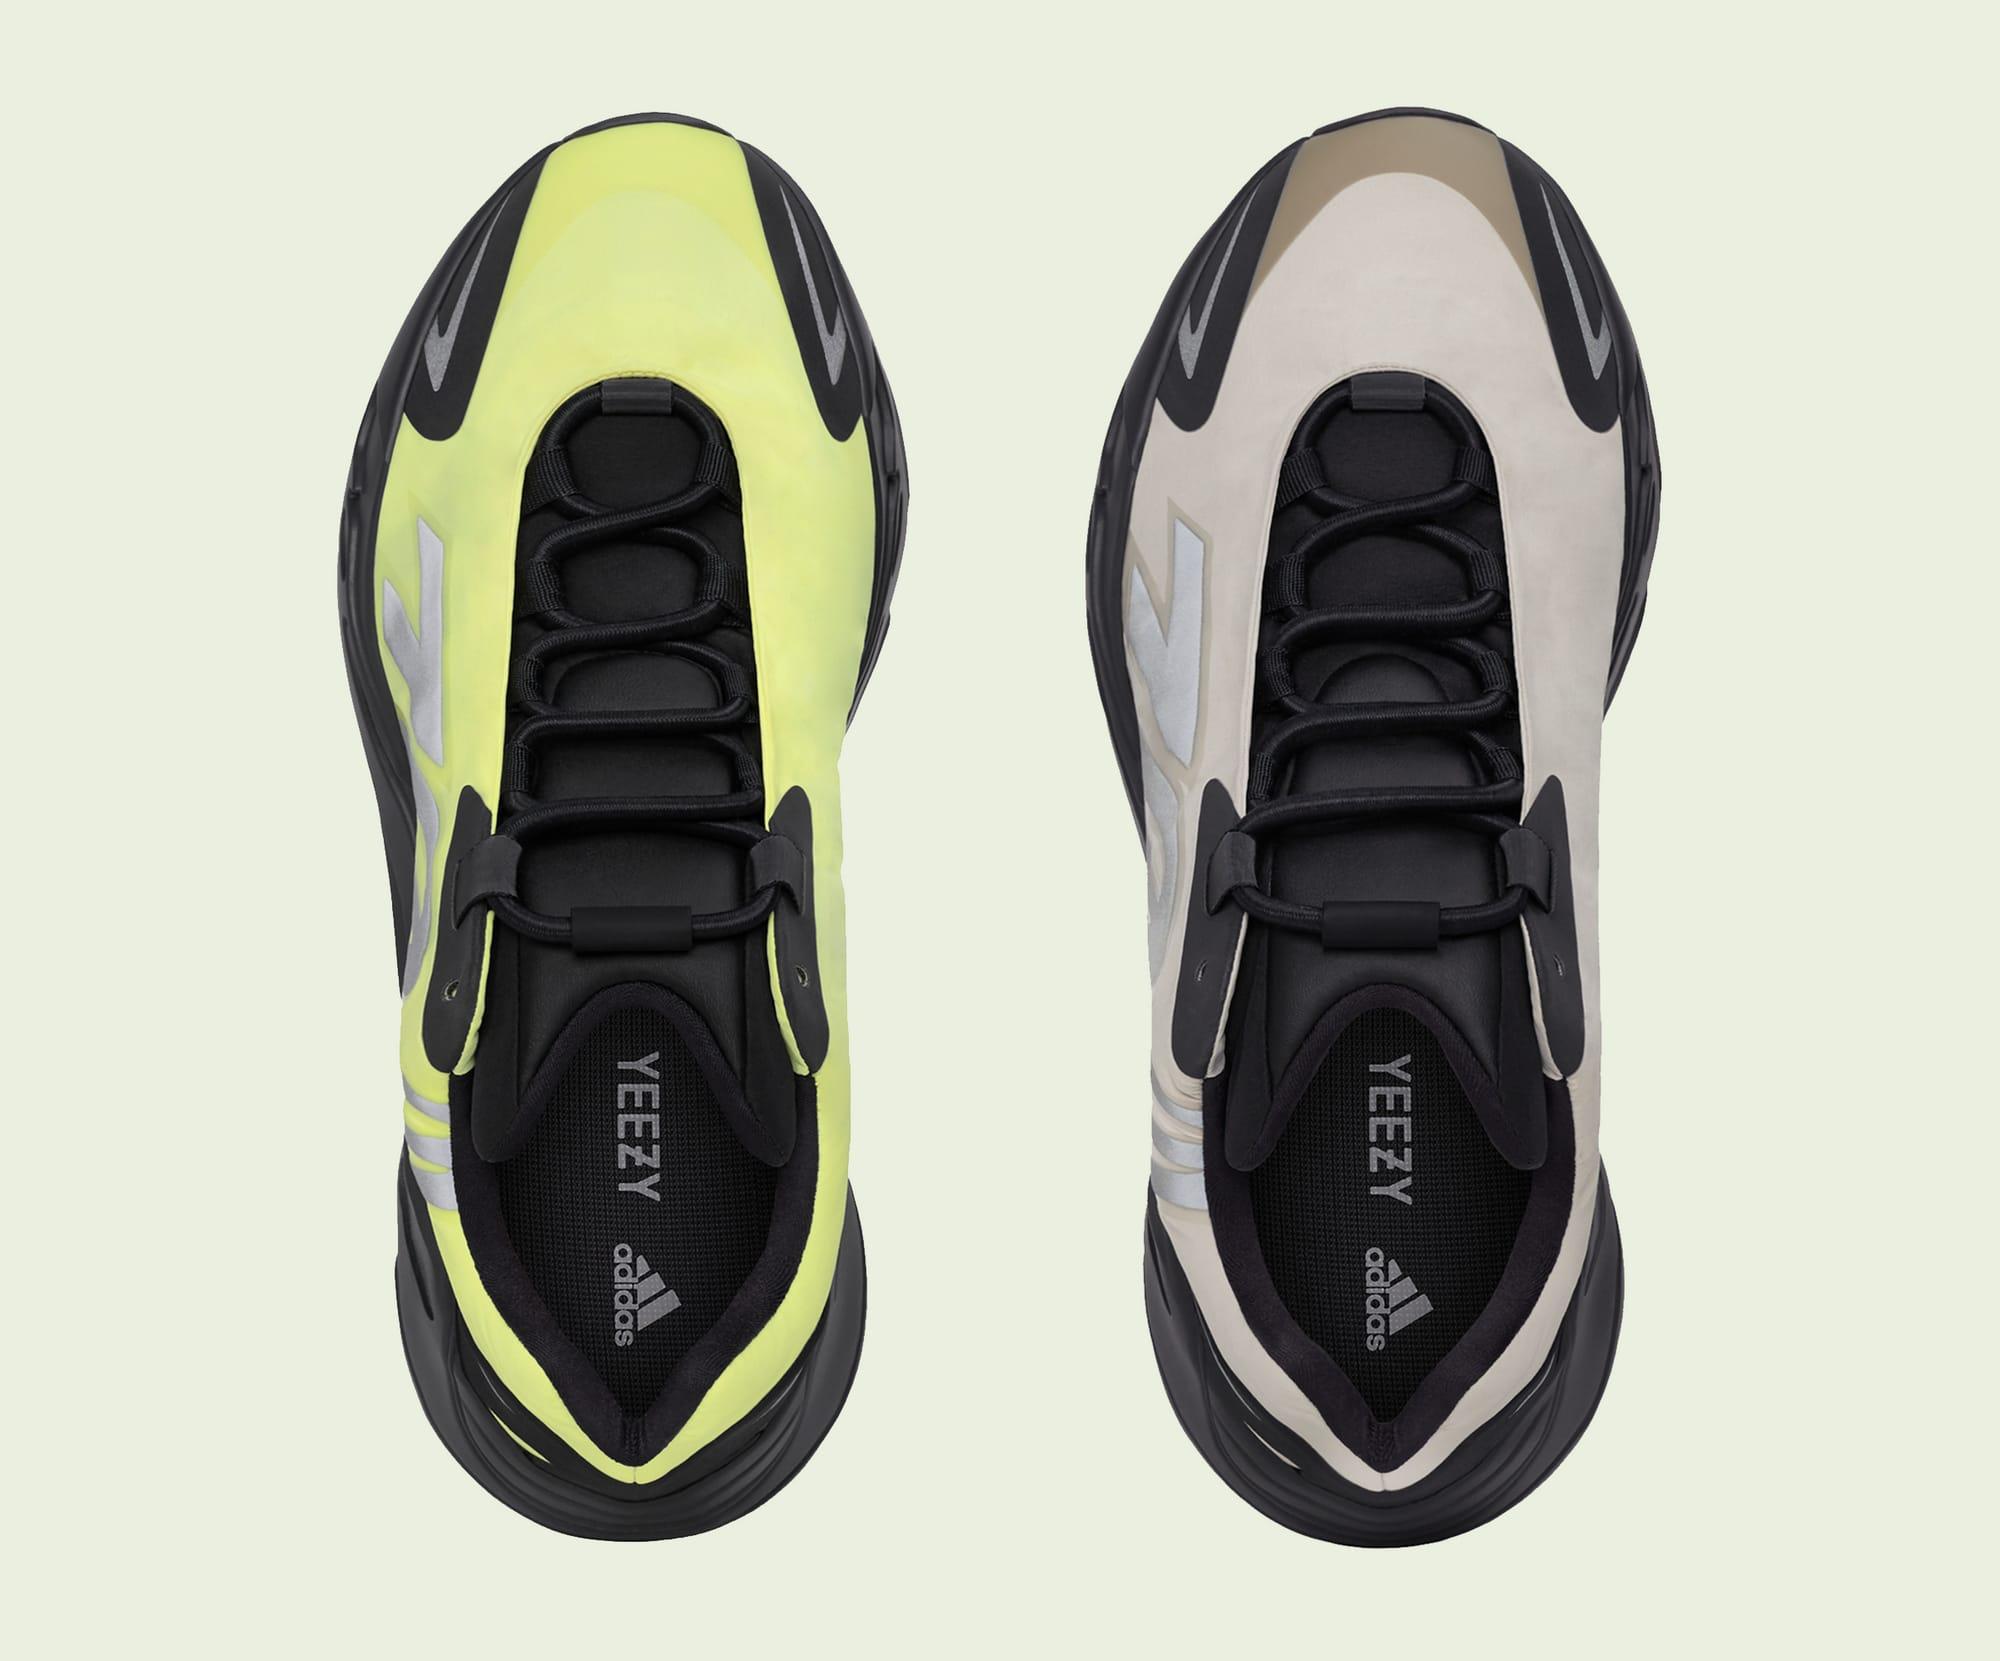 Adidas Yeezy Boost 700 MNVN 'Phosphor' 'Bone' Top